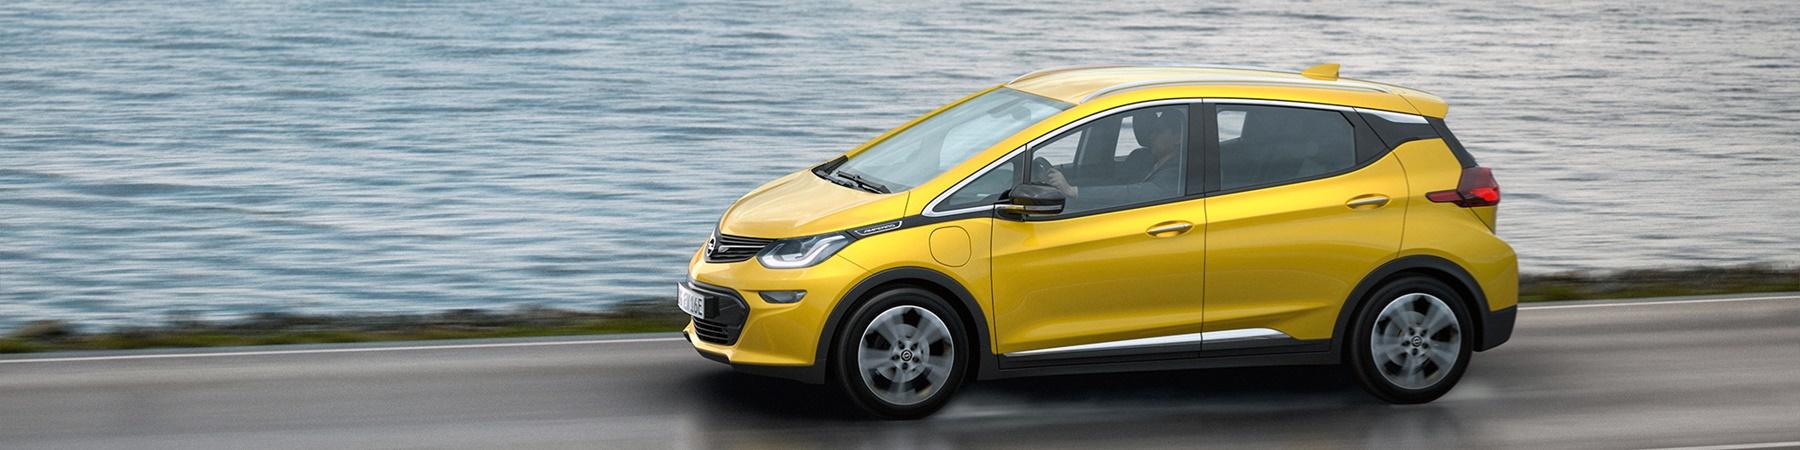 Opel Ampera-e 60kWh 323 km actieradius